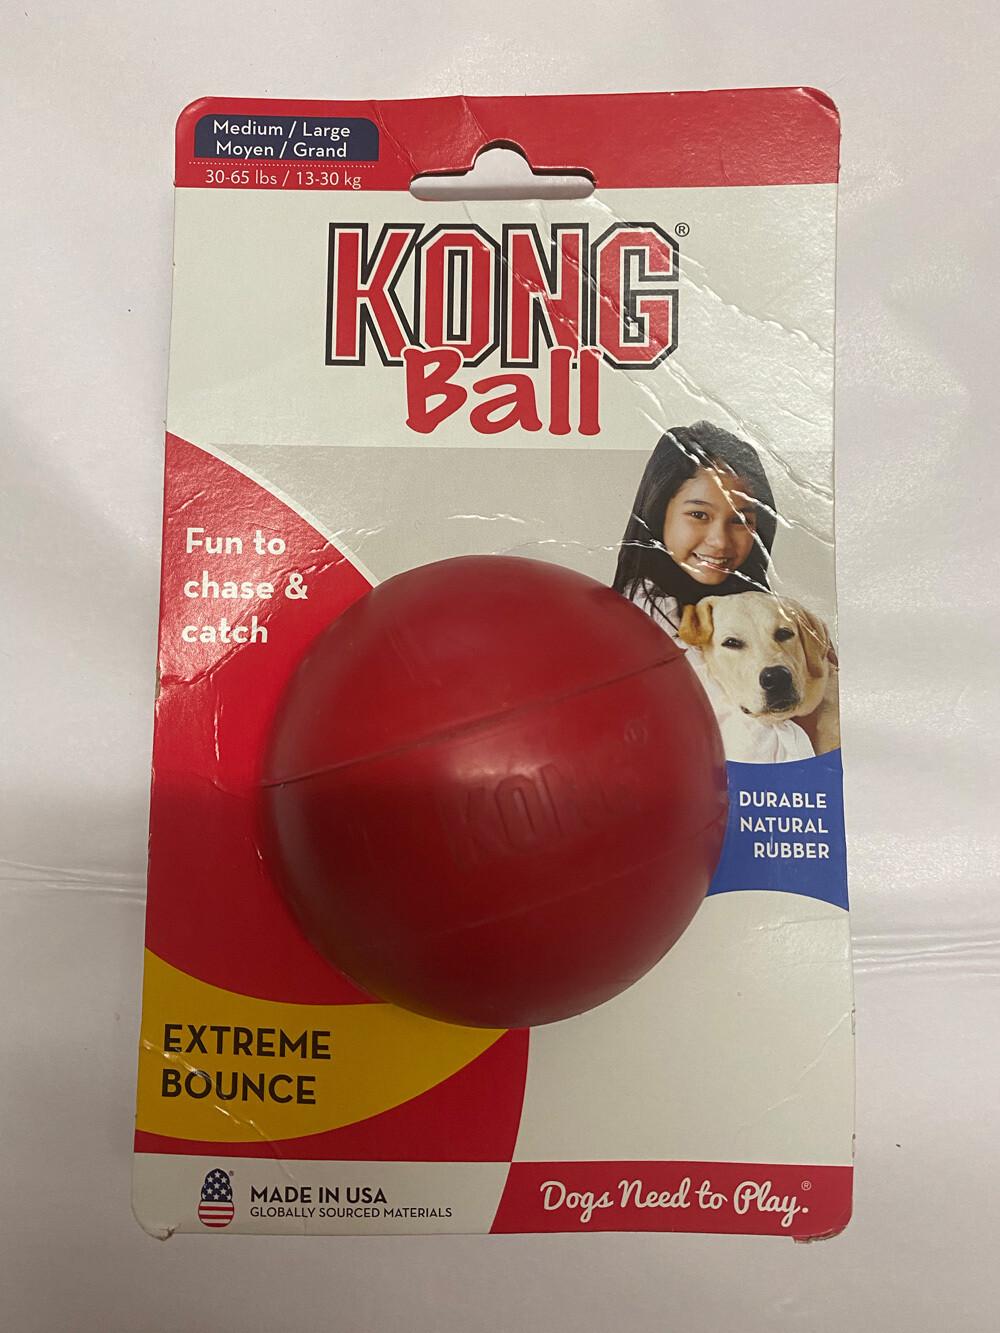 KONG Dog Ball - Medium/ Large